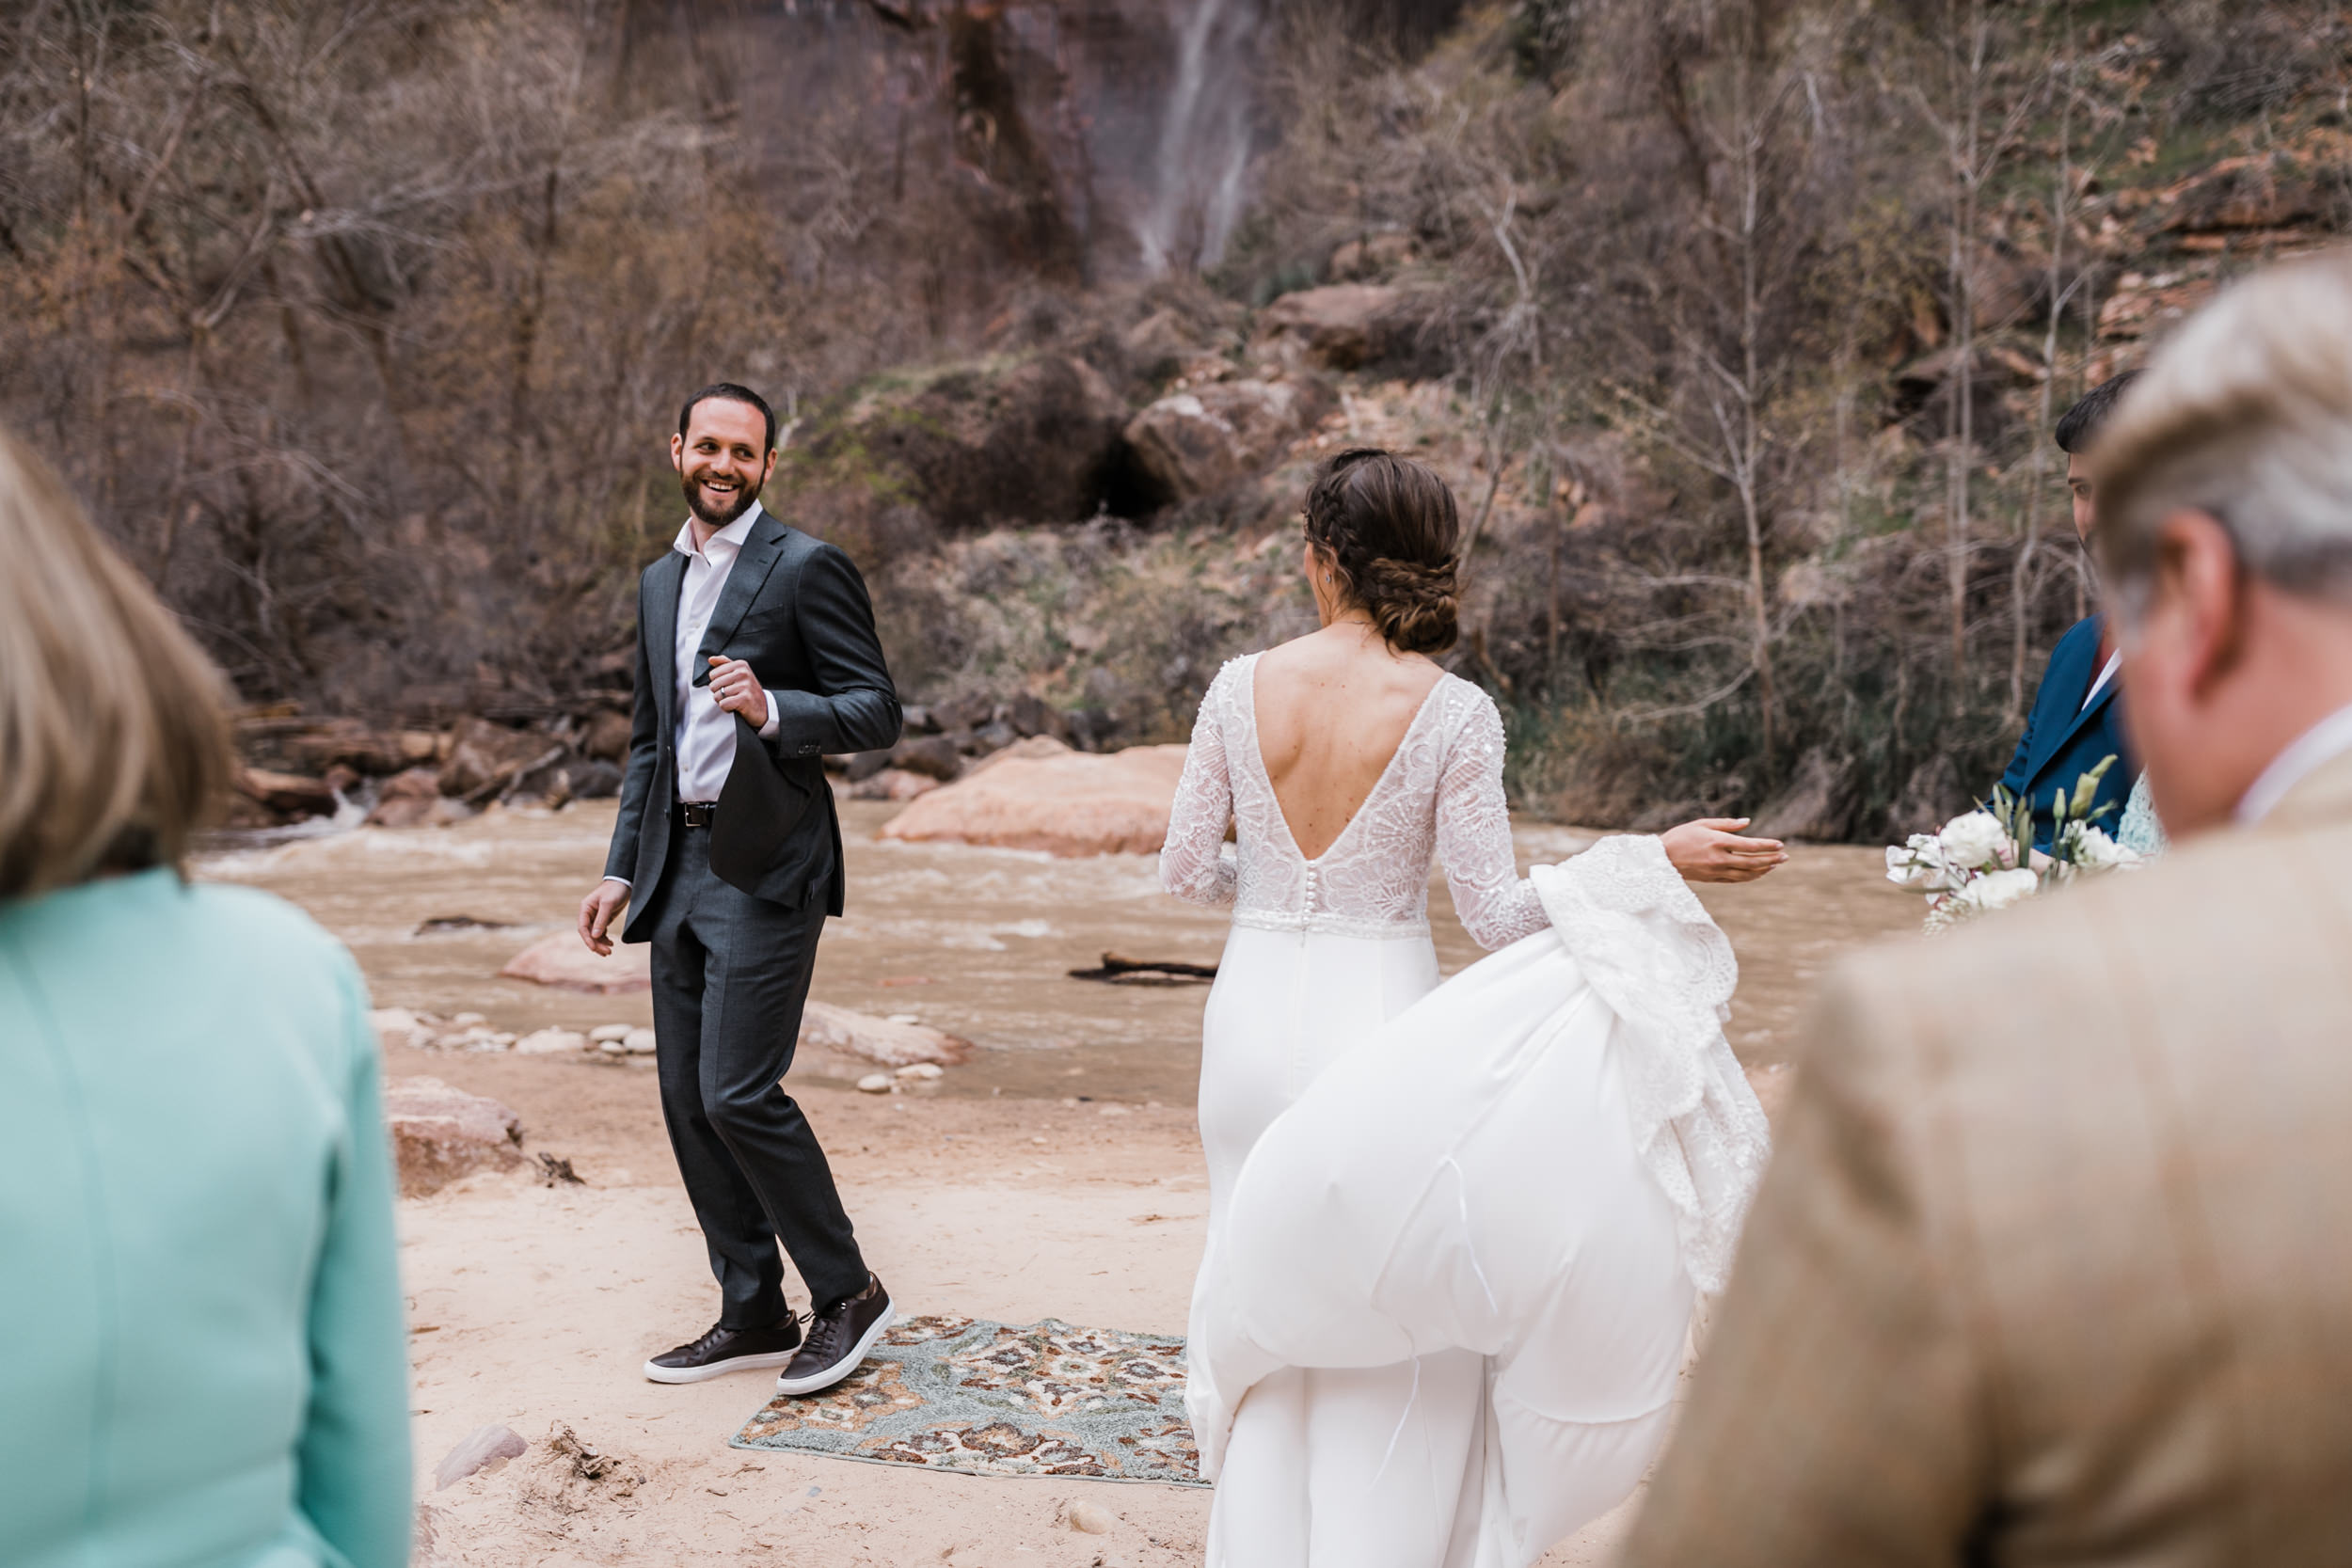 Zion-National-Park-Adventure-Wedding-Hearnes-Elopement-Photography-21.jpg